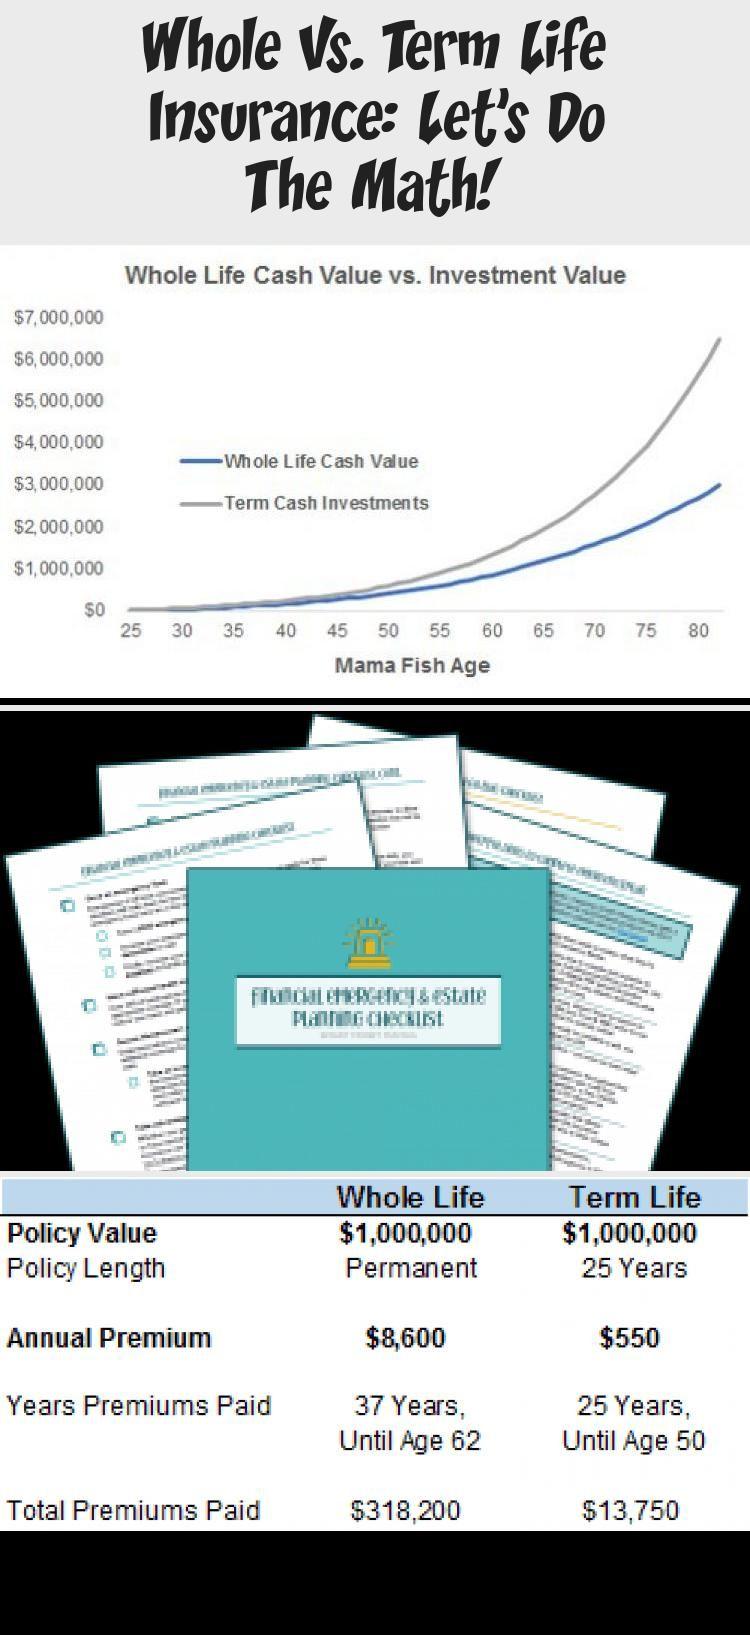 Whole vs. Term Life Insurance Let's Do the Math! Smart